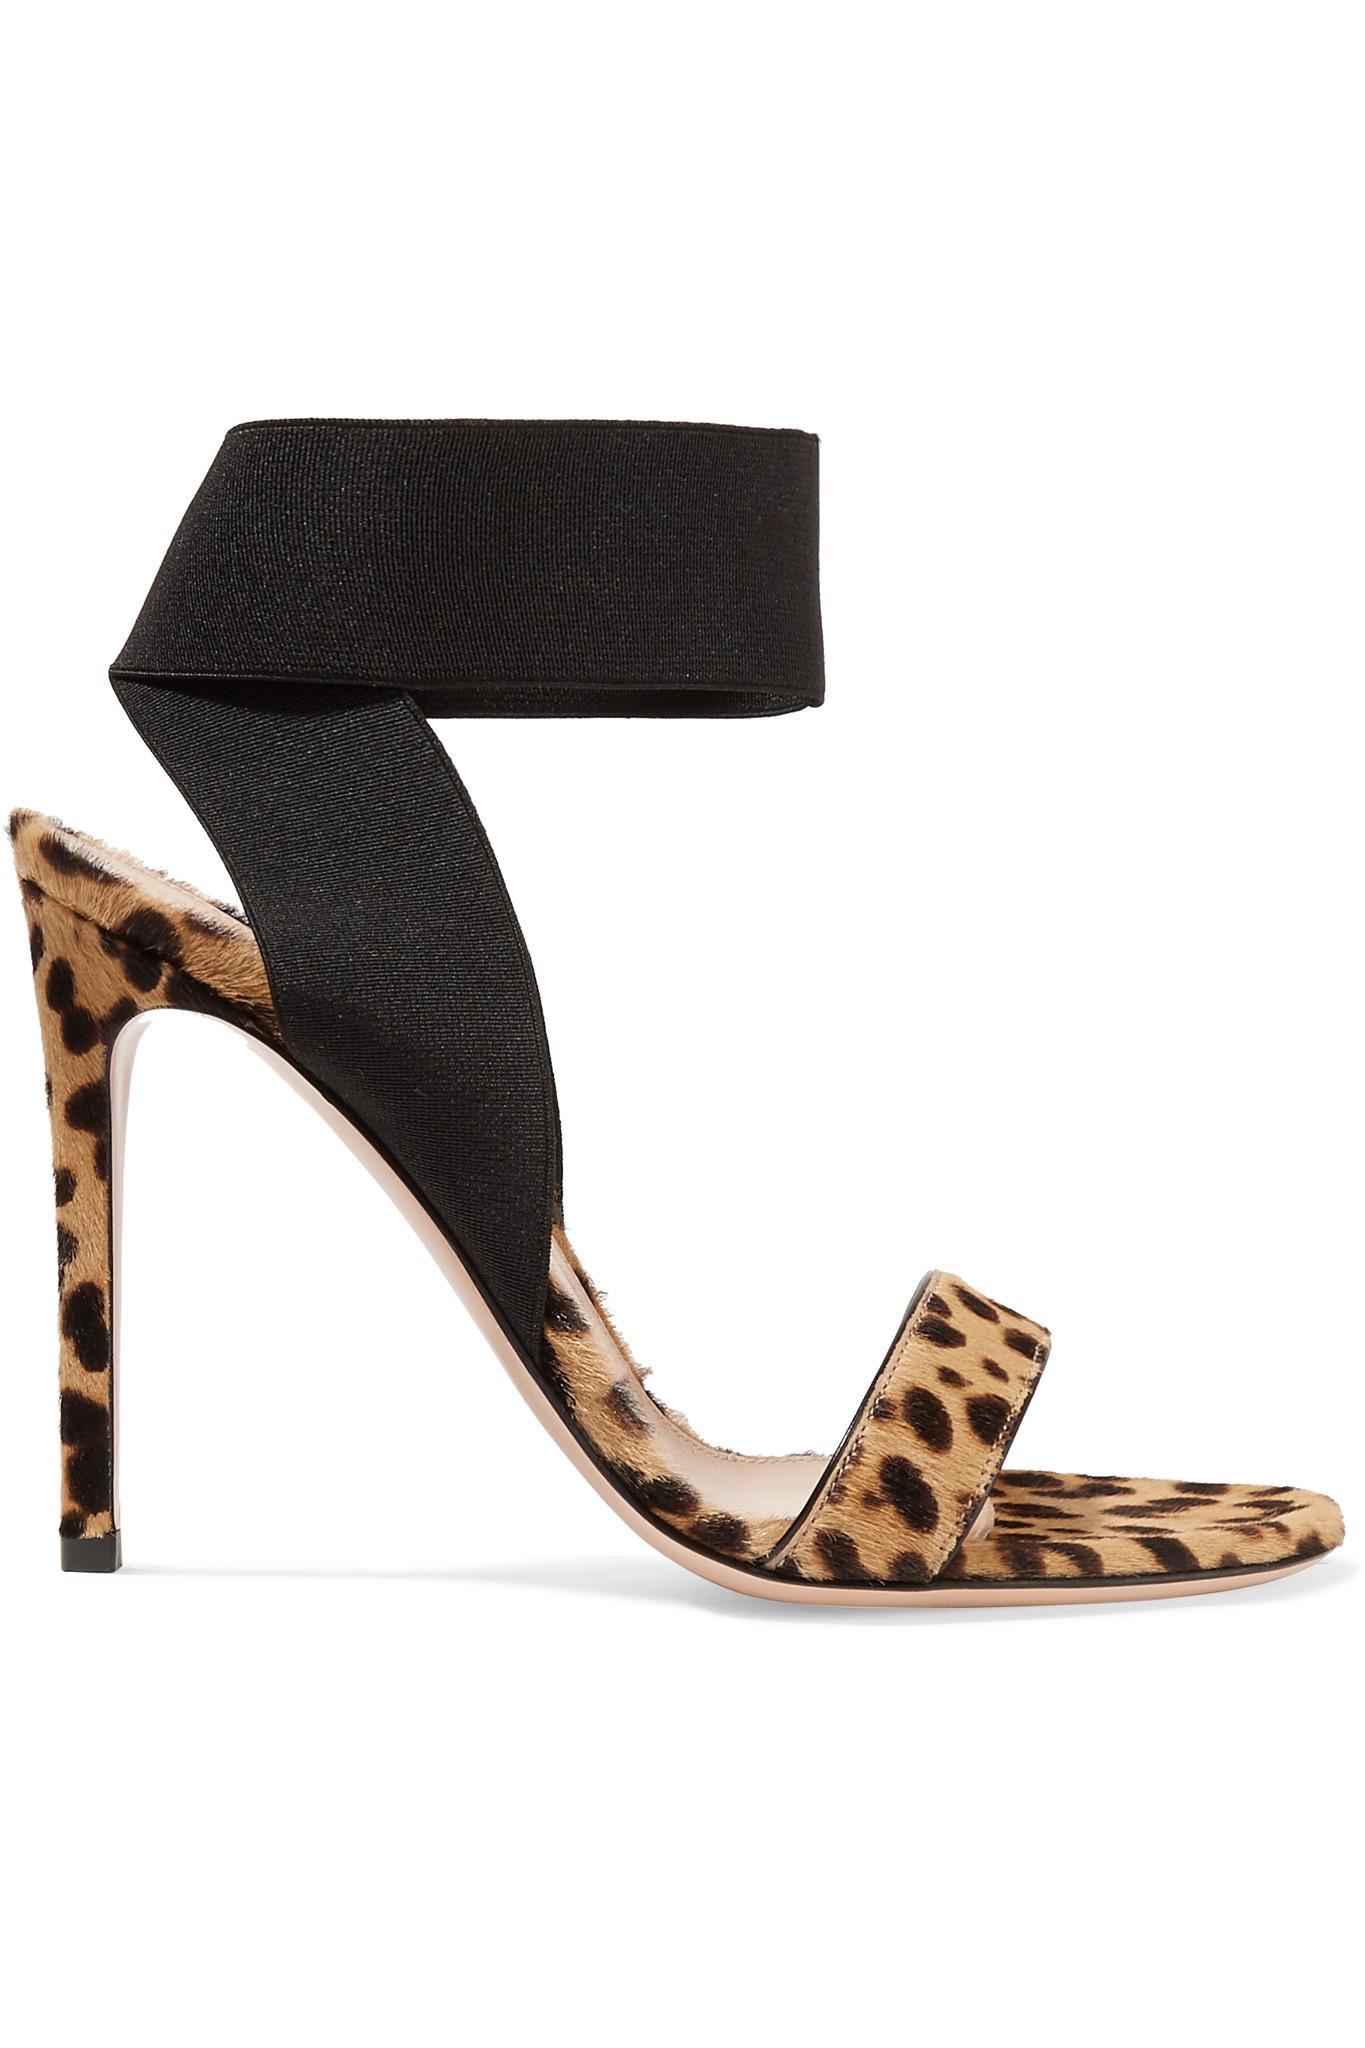 c55937702dde Gianvito Rossi. Women s 105 Leopard-print Calf Hair Sandals